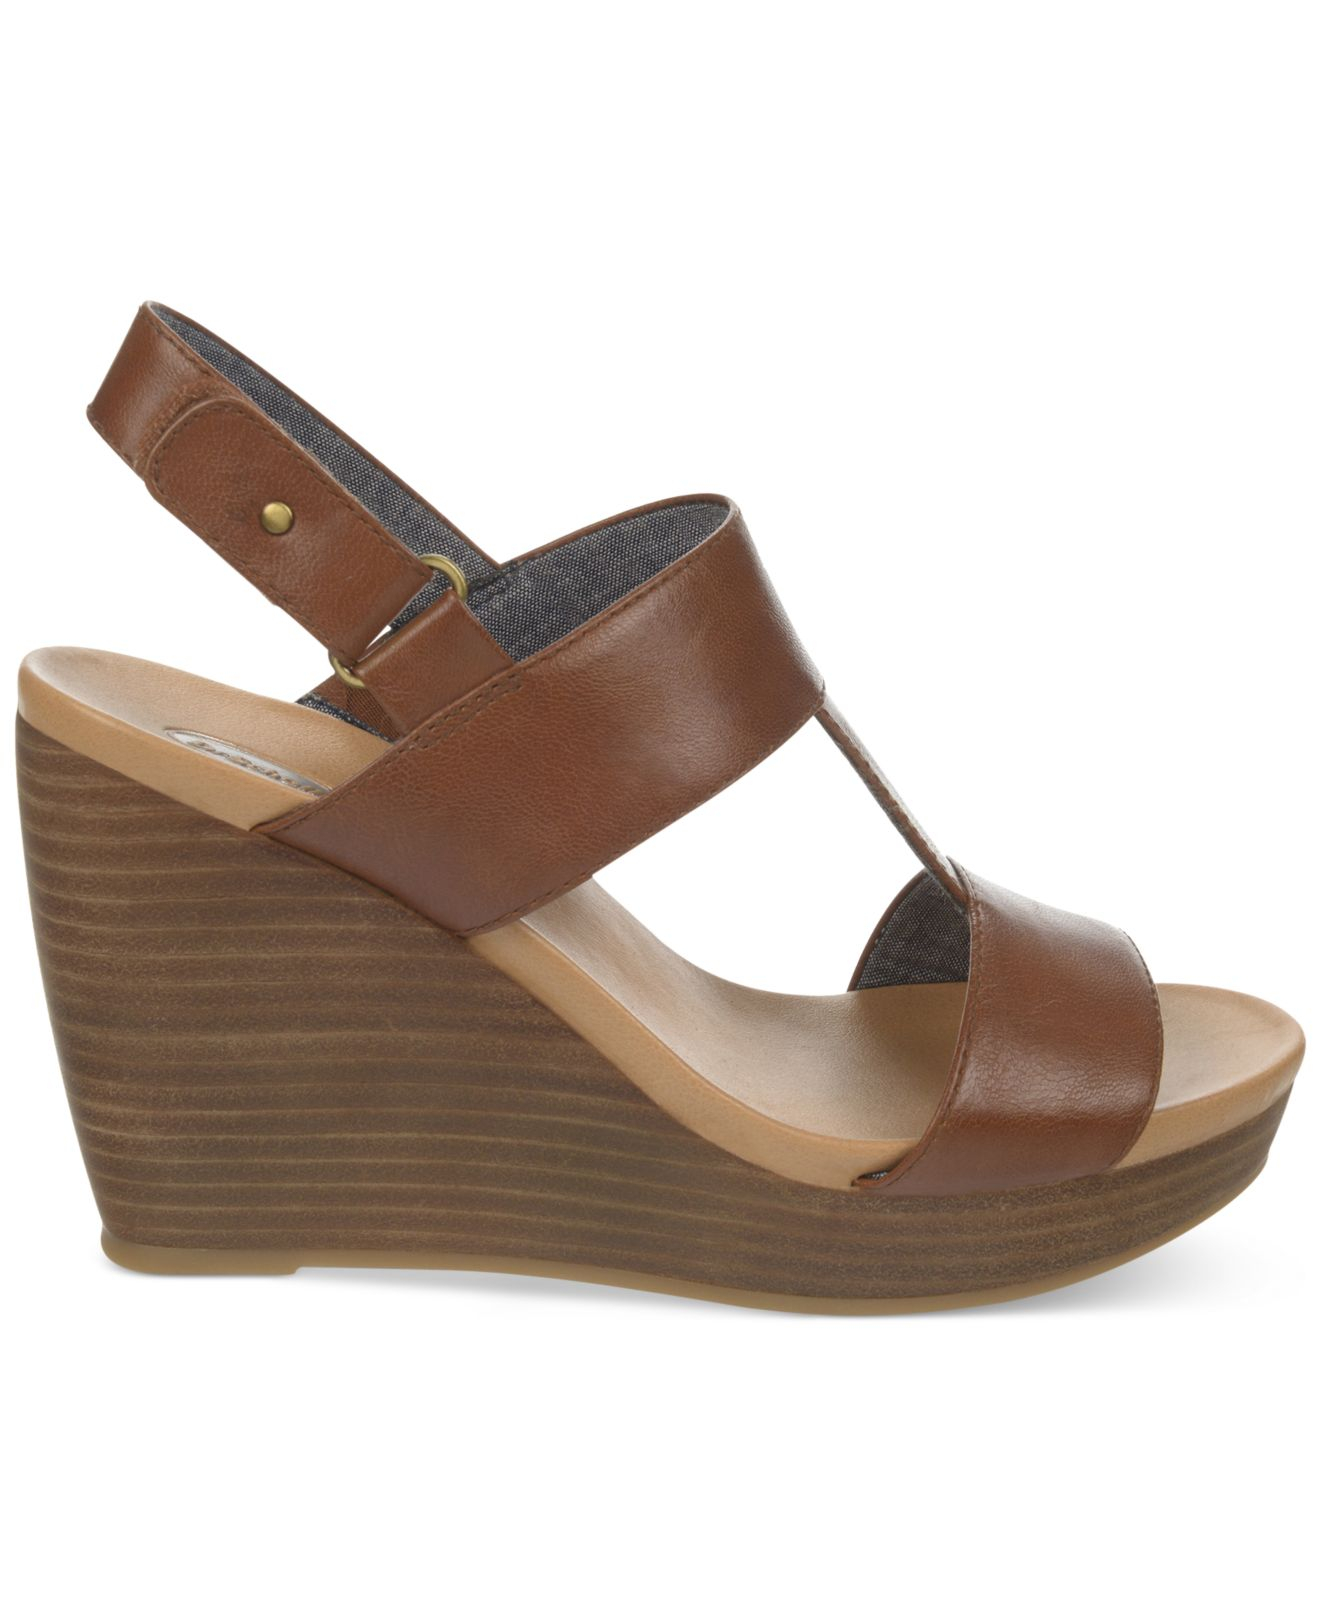 0637d5521b6c9e Lyst - Dr. Scholls Mica Platform Wedge Sandals in Brown